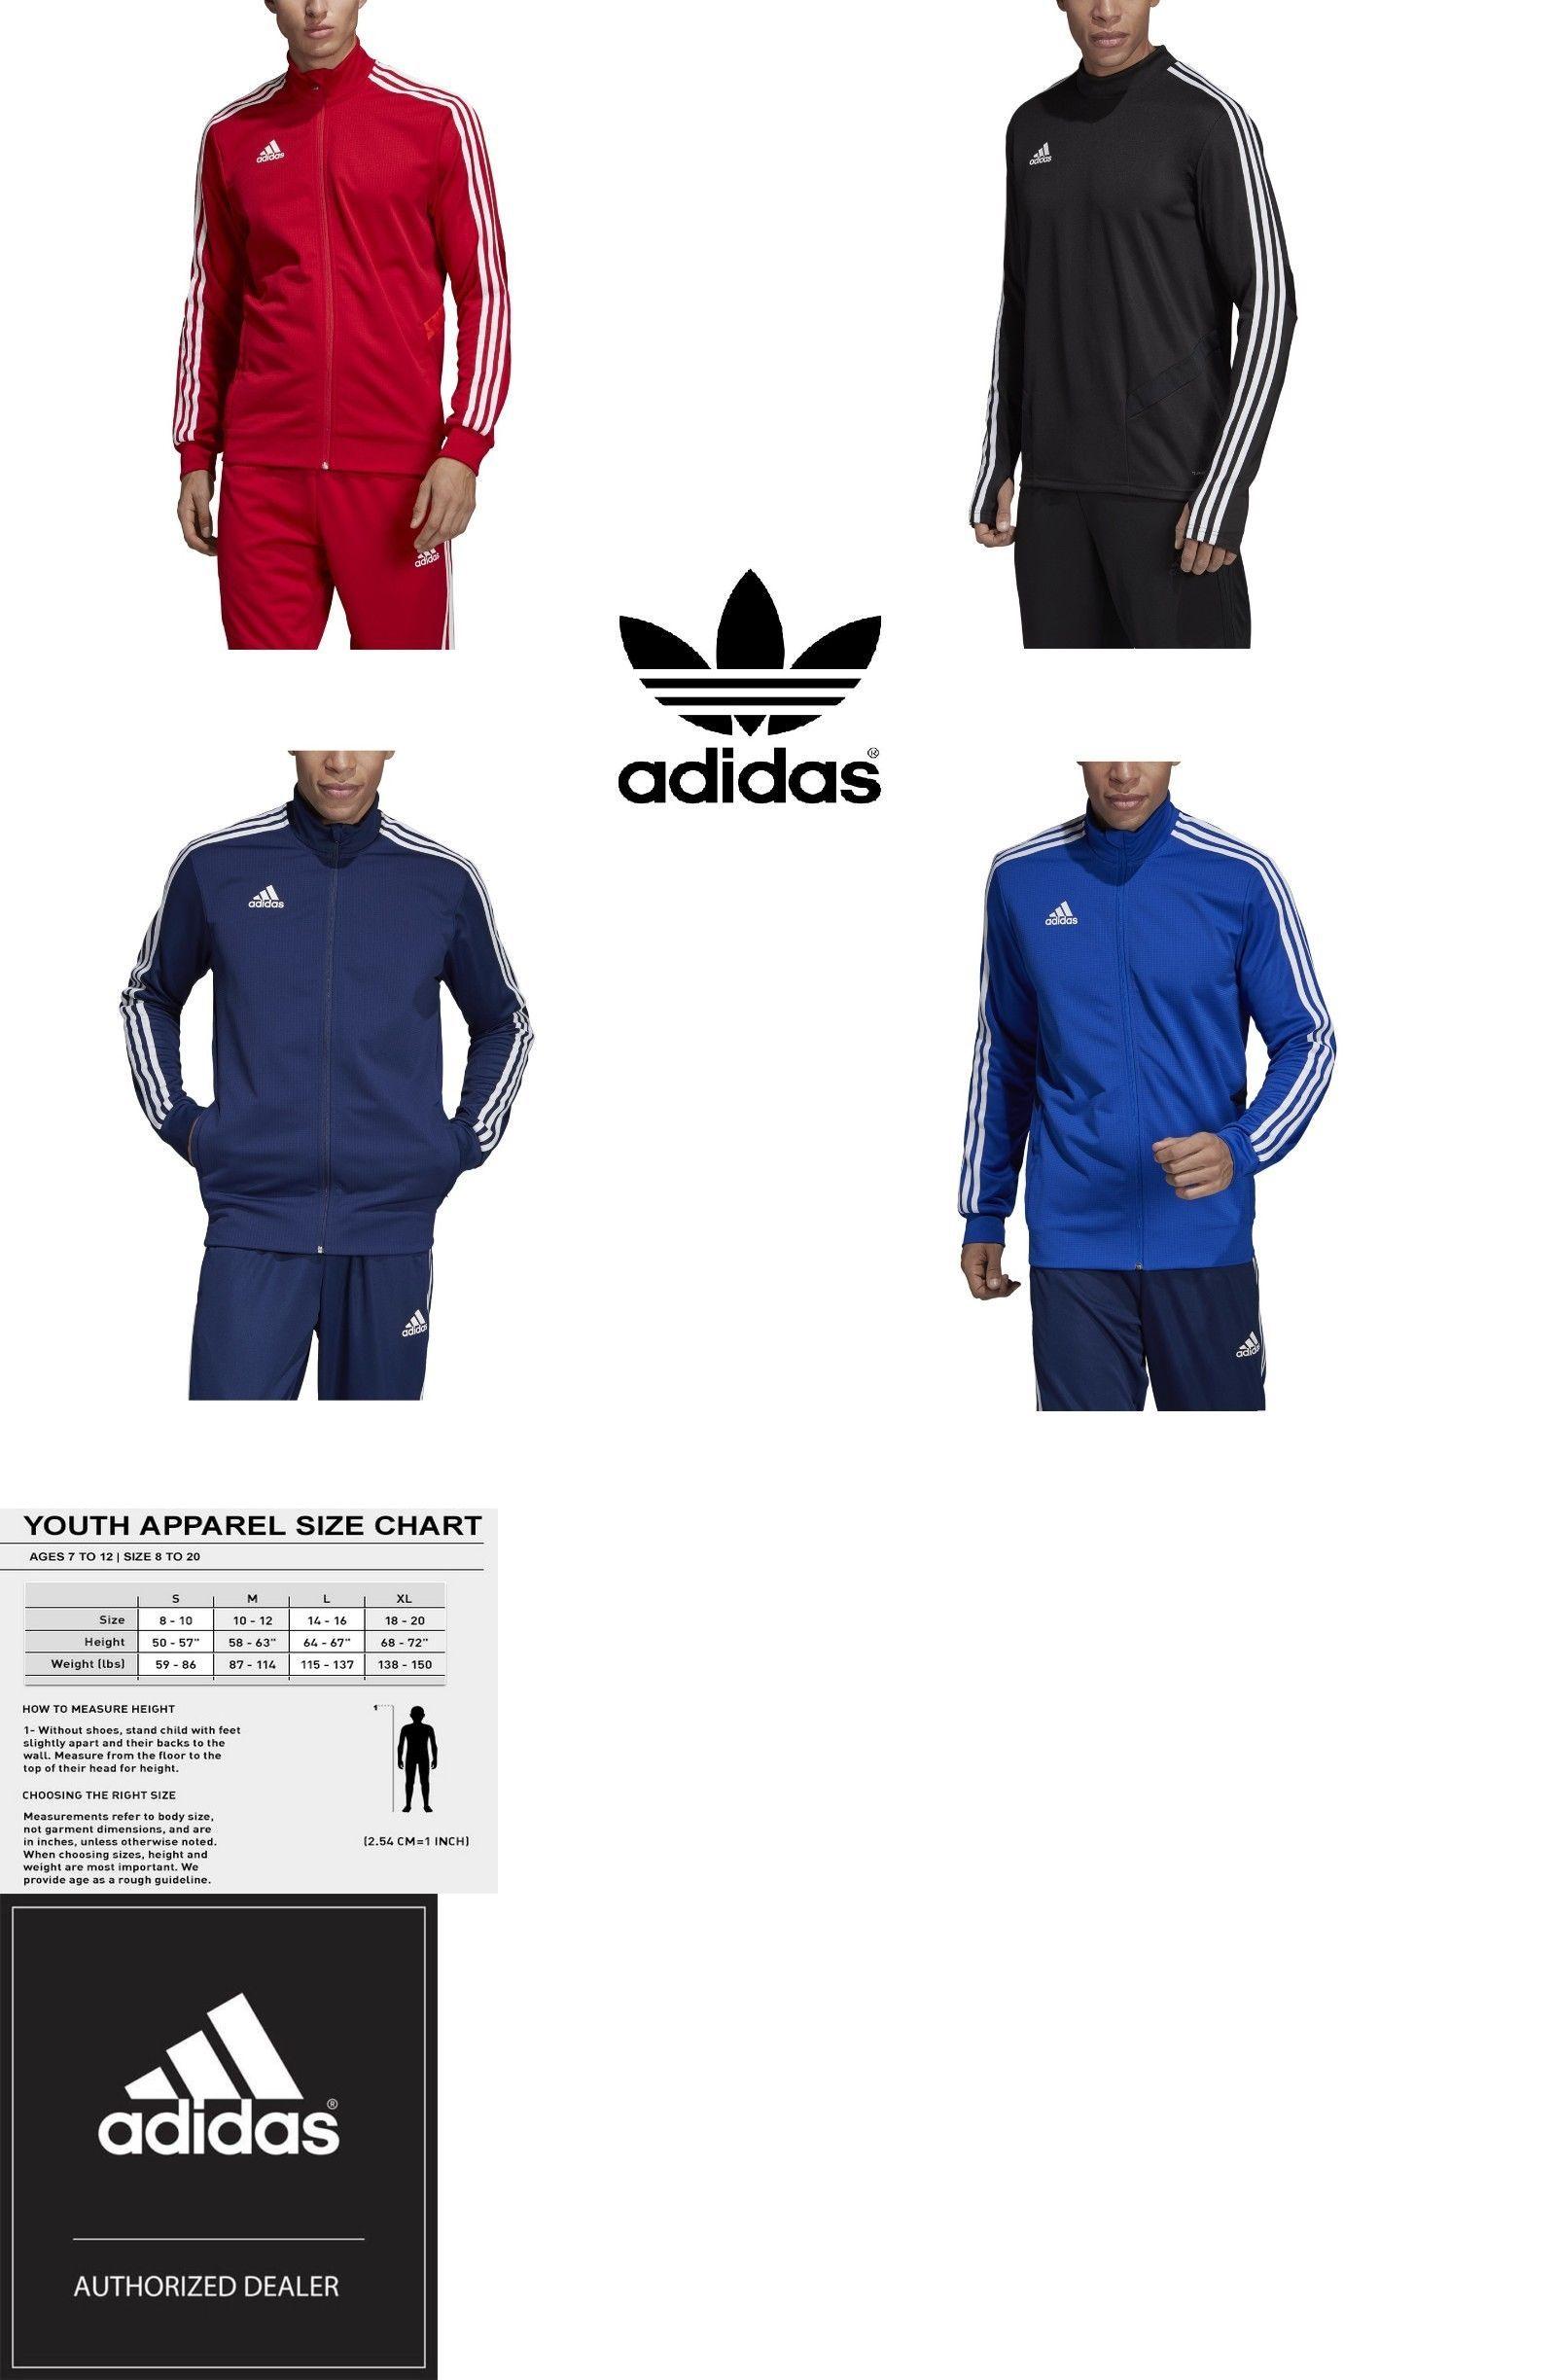 c605c44f9485 Other Unisex Clothing 155203: Adidas Kid S Youth Tiro 19 Track Suit Jacket  Combo Sweatpants And Coat -> BUY IT NOW ONLY: $34.99 on #eBay #other  #unisex ...